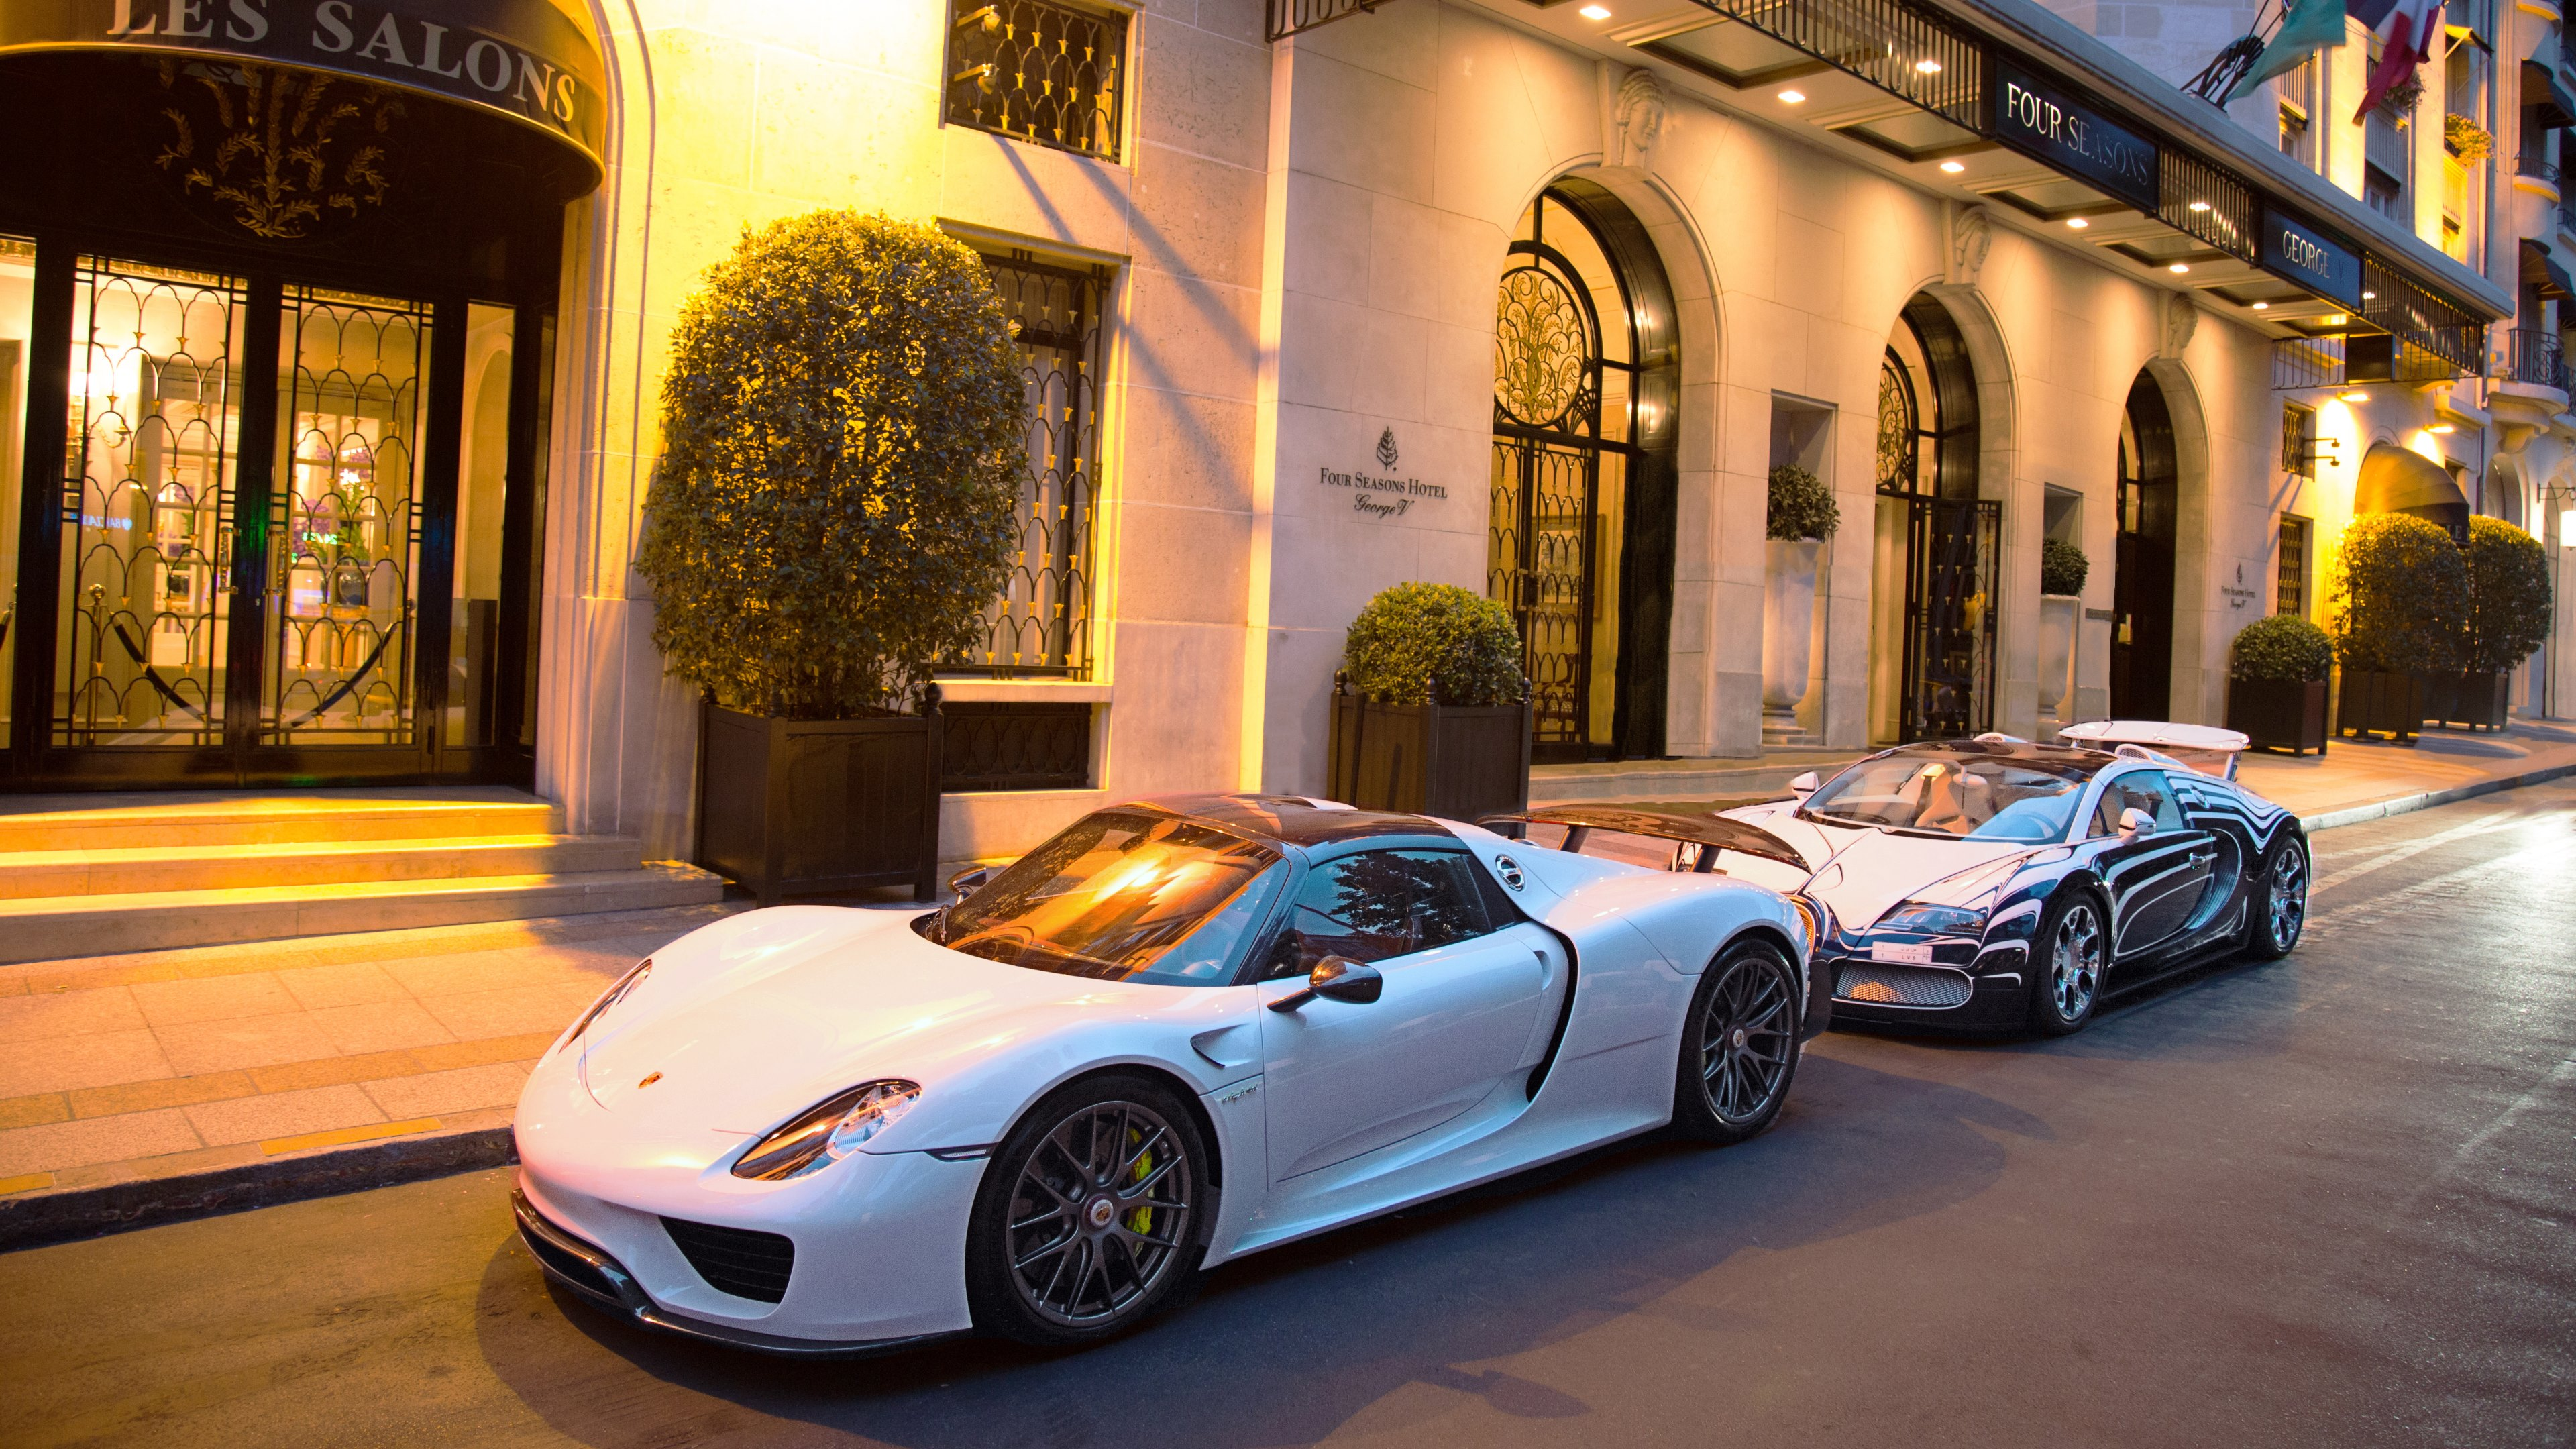 Porsche_918_Spyder_London_Streets_uhd Remarkable Porsche 918 Spyder In London Cars Trend